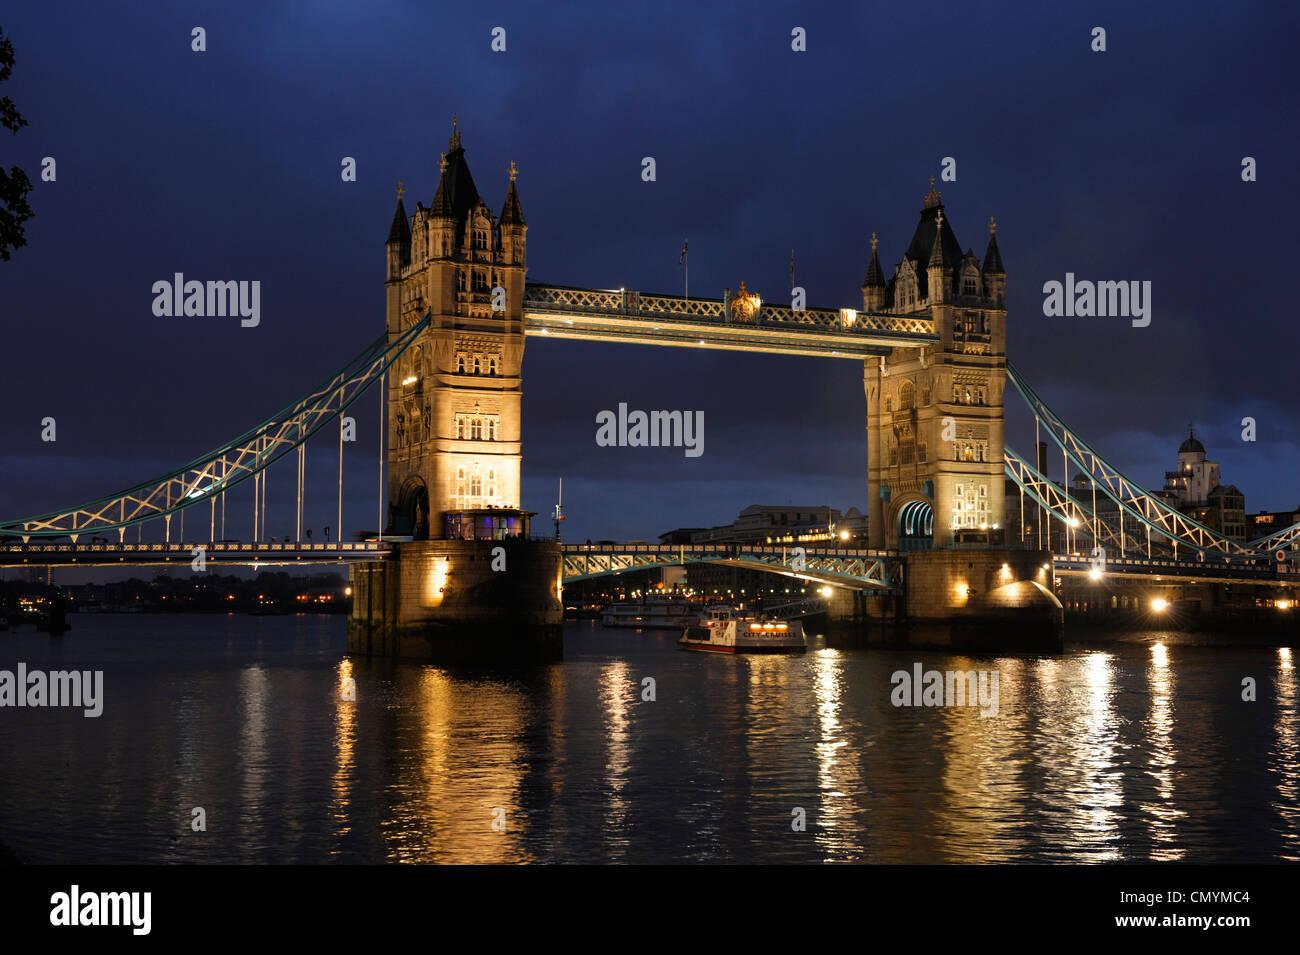 United Kingdom, London, Tower Bridge a lift bridge at night - Stock Image